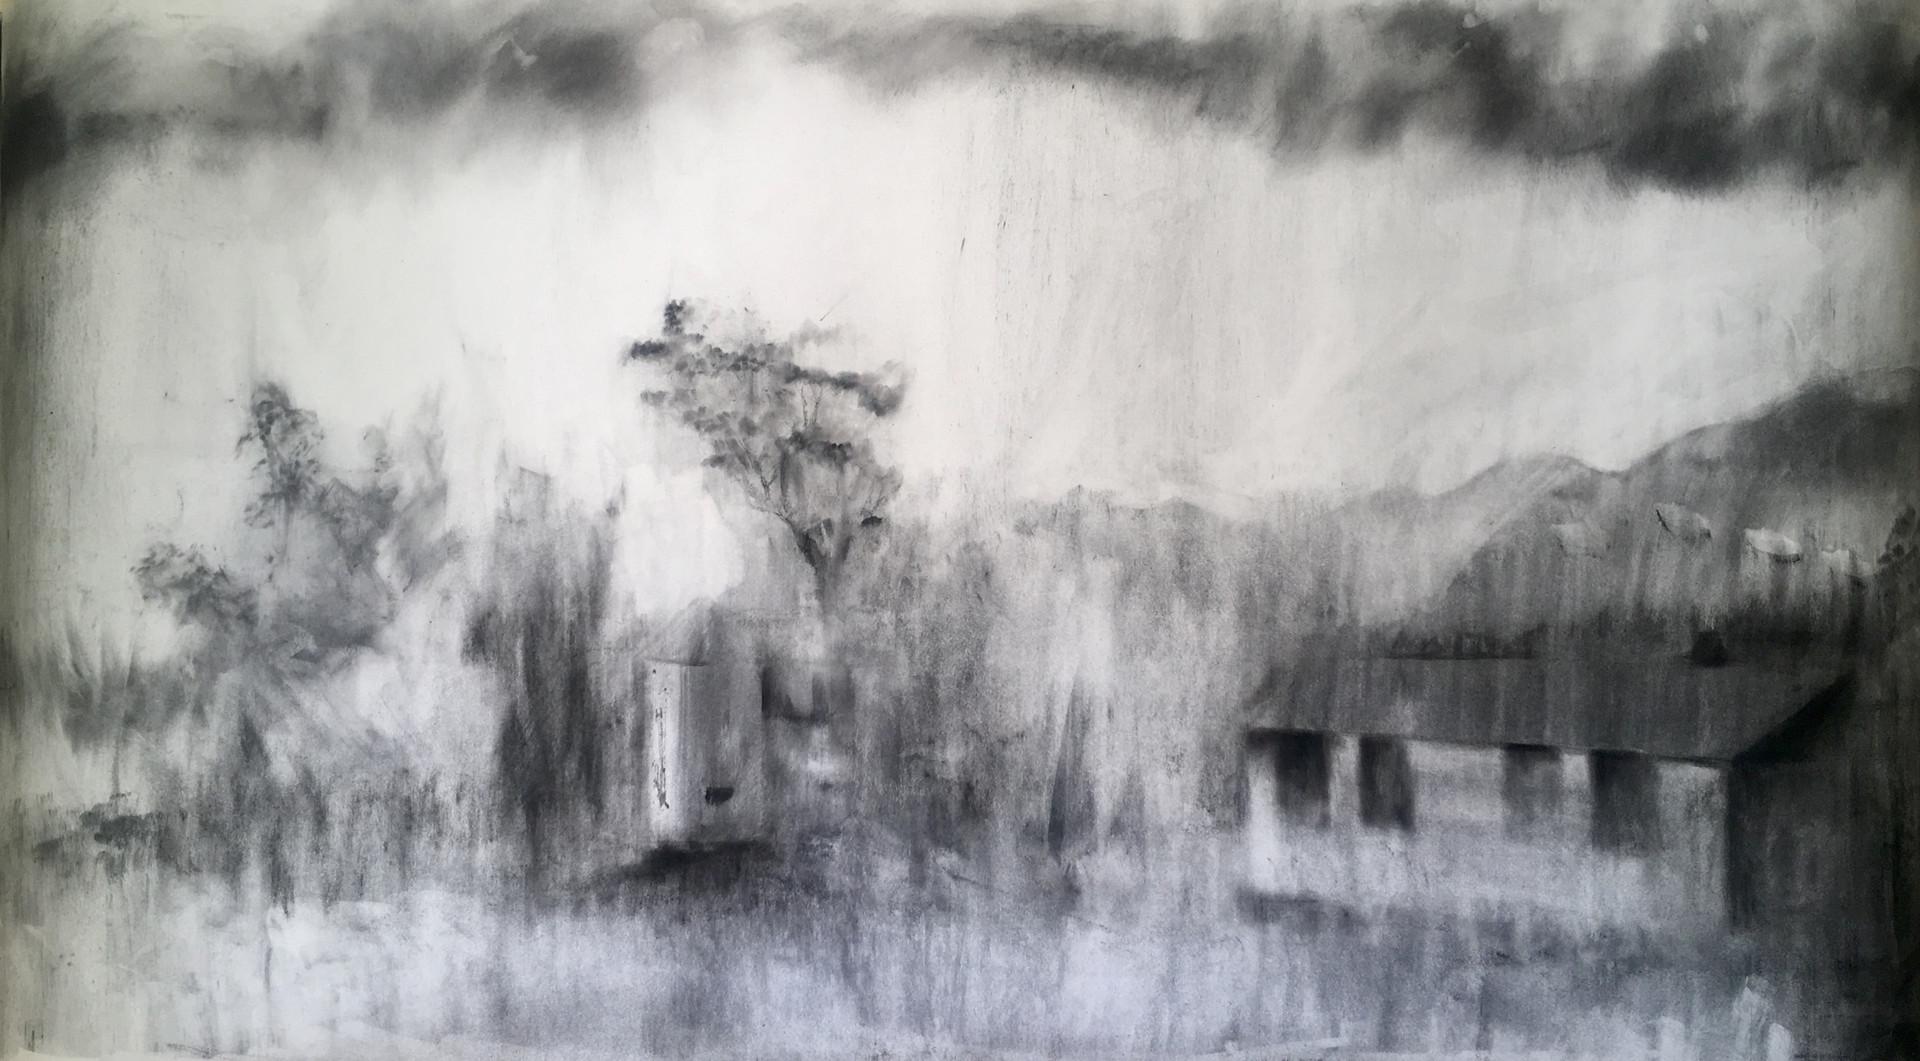 DWARS IN DIE WEG  2019 Charcoal on paper 71 x 130cm